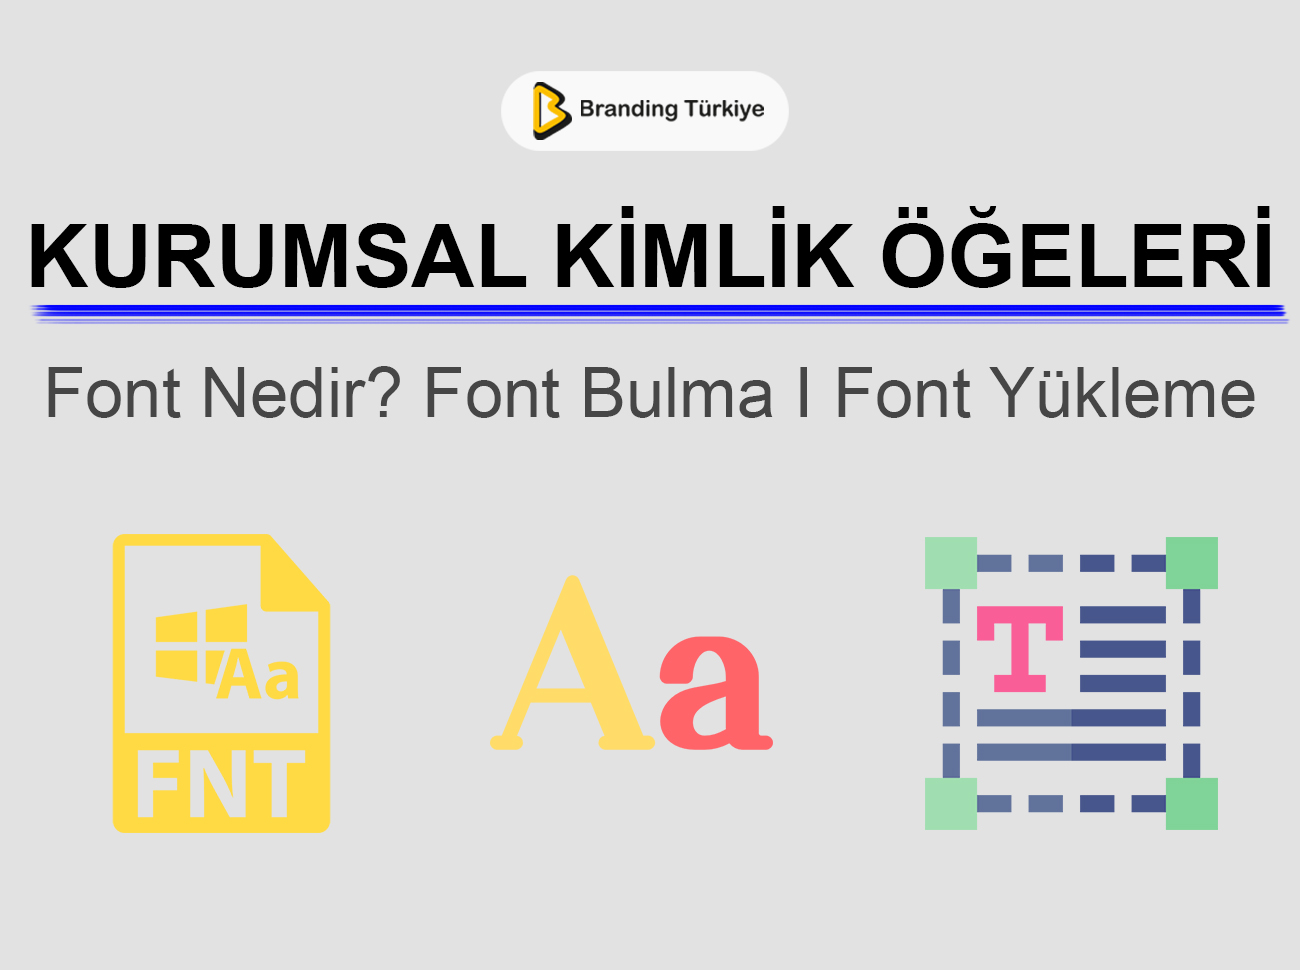 Font Nedir? Font Bulma Ve Font Yükleme